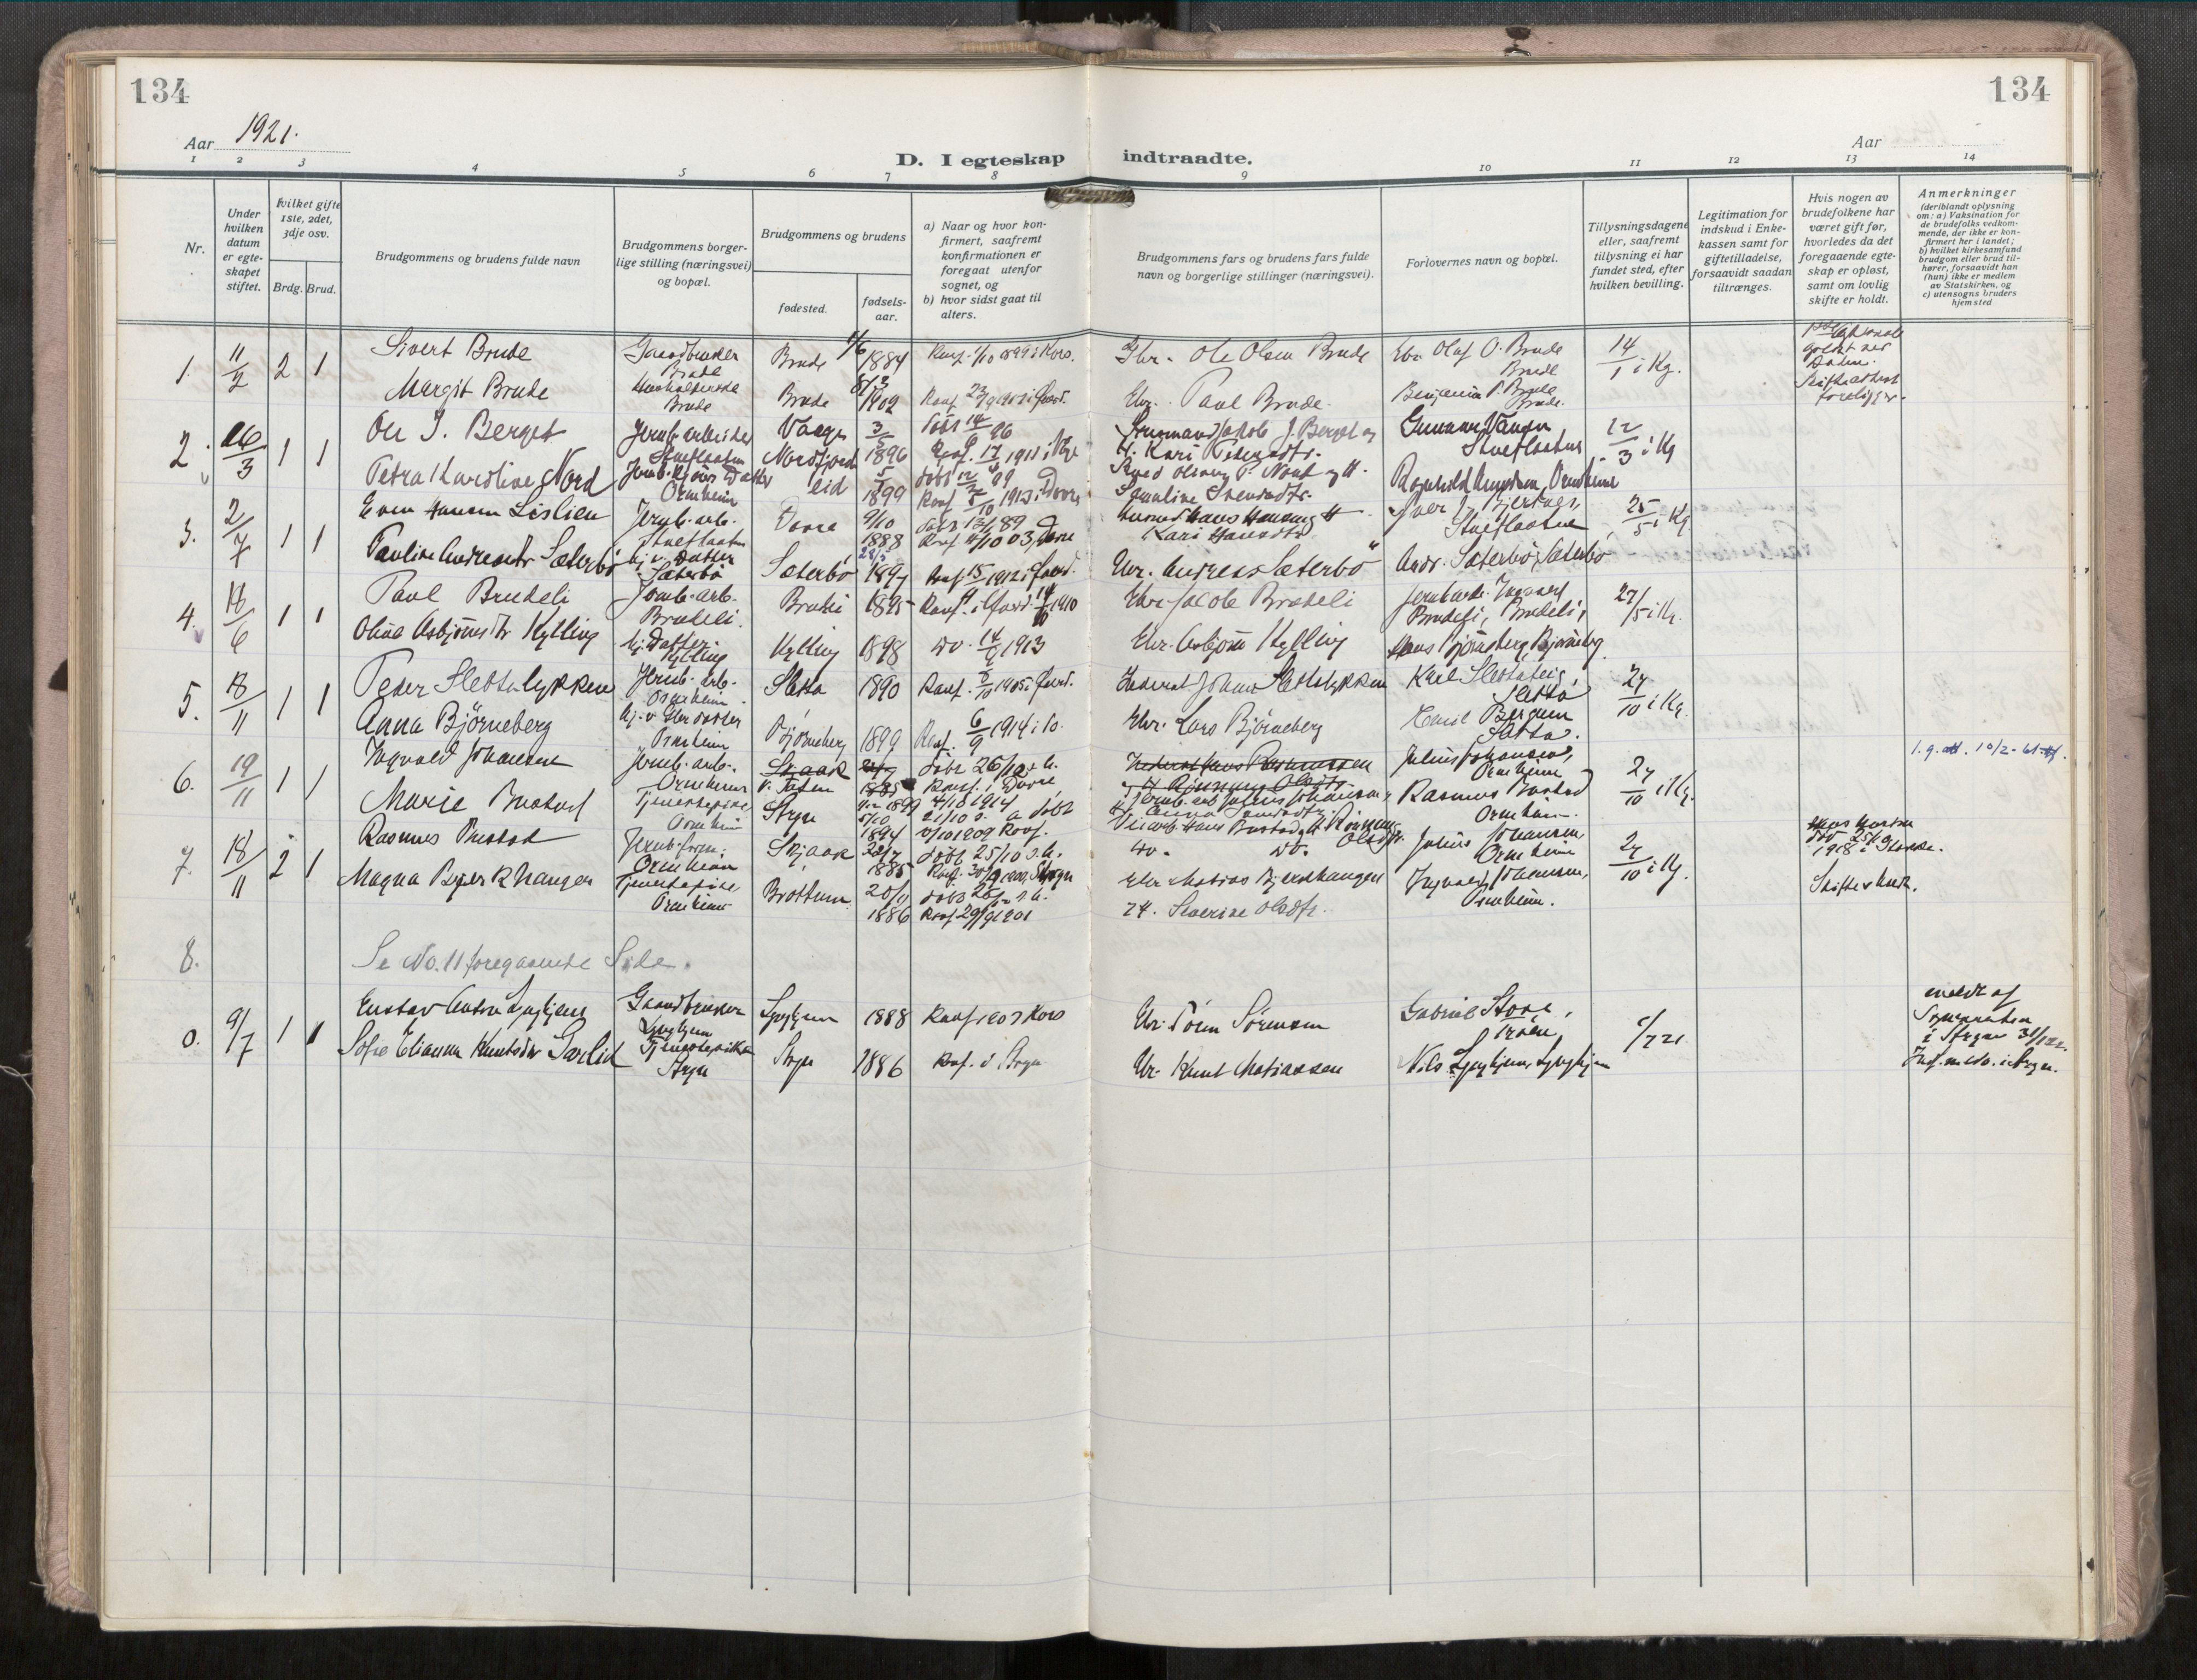 SAT, Grytten sokneprestkontor, Ministerialbok nr. 546A04, 1919-1956, s. 134